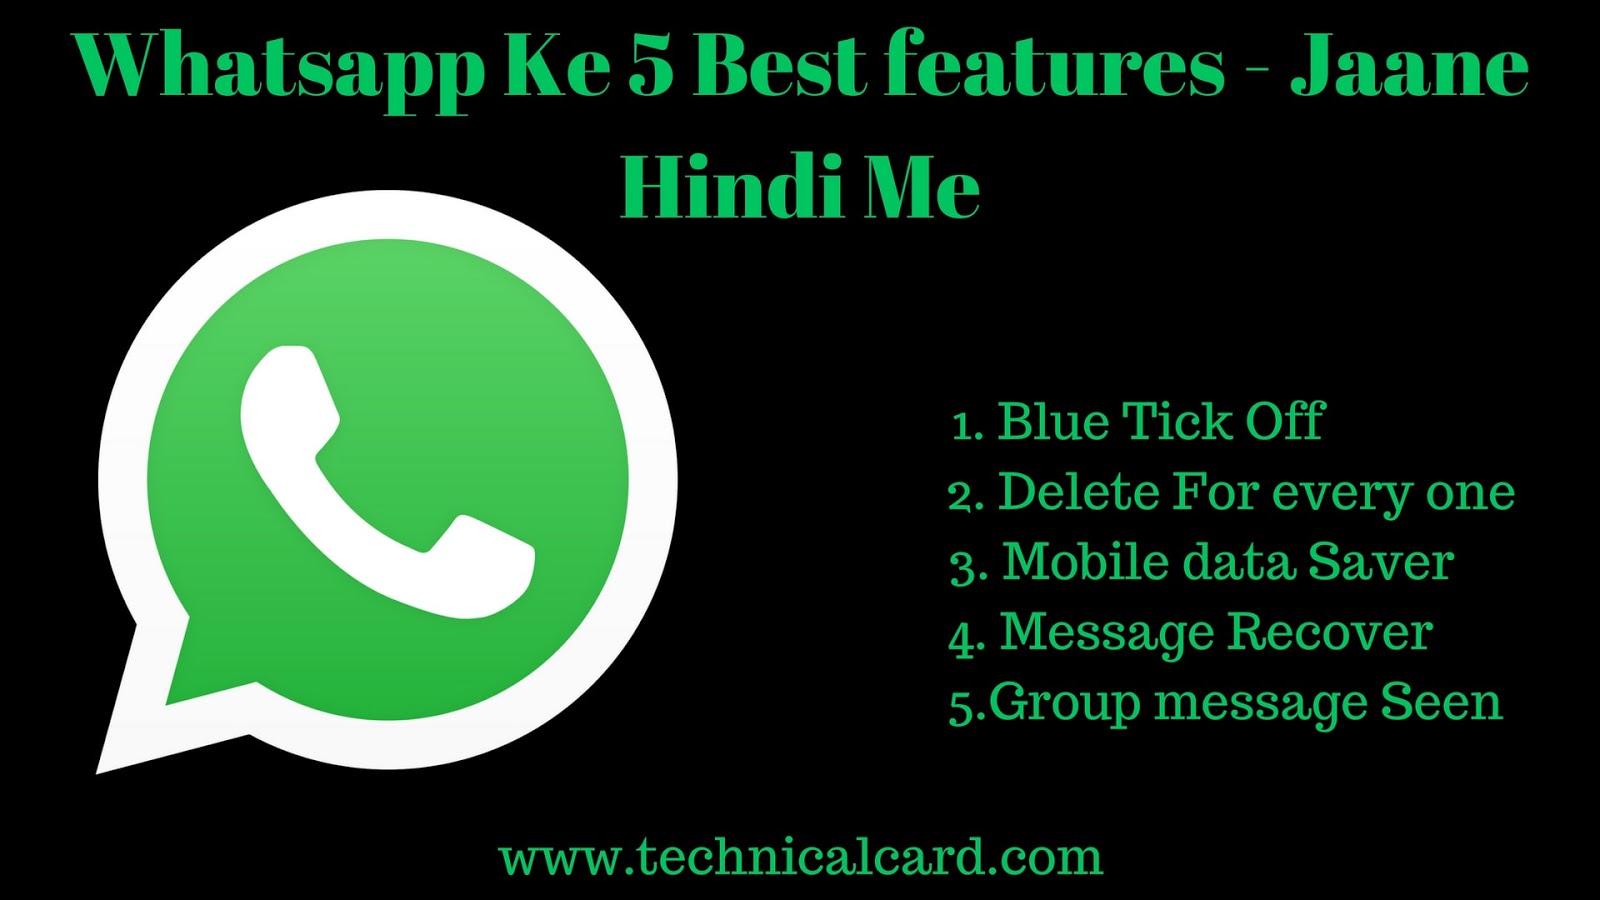 Whatsapp Ke 5 Best features, whatsapp new update features